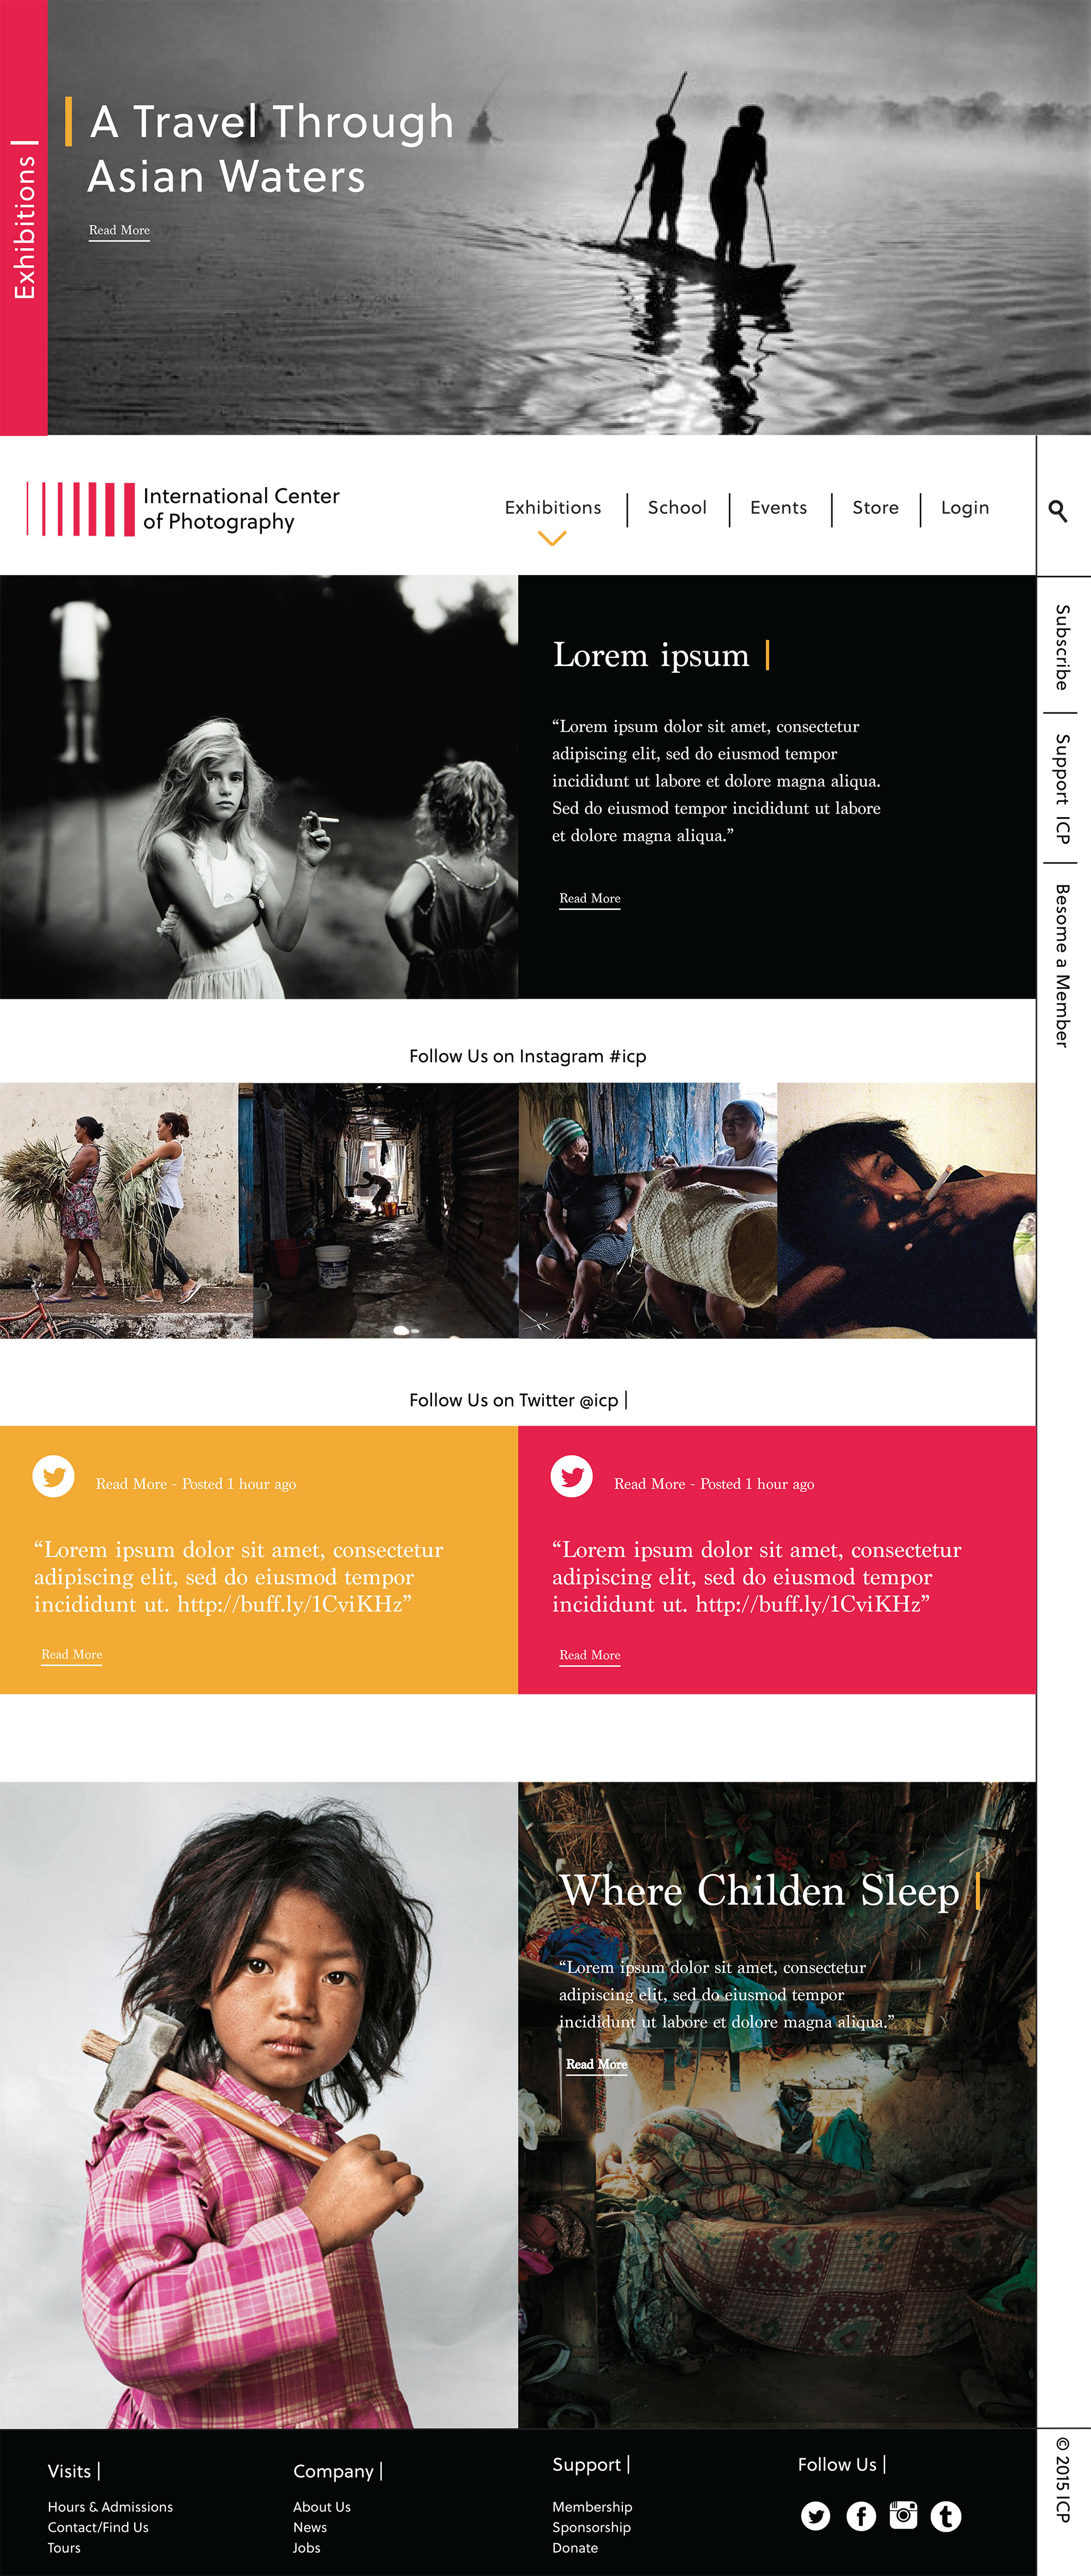 ICP_Web_Original_Homepage.jpg